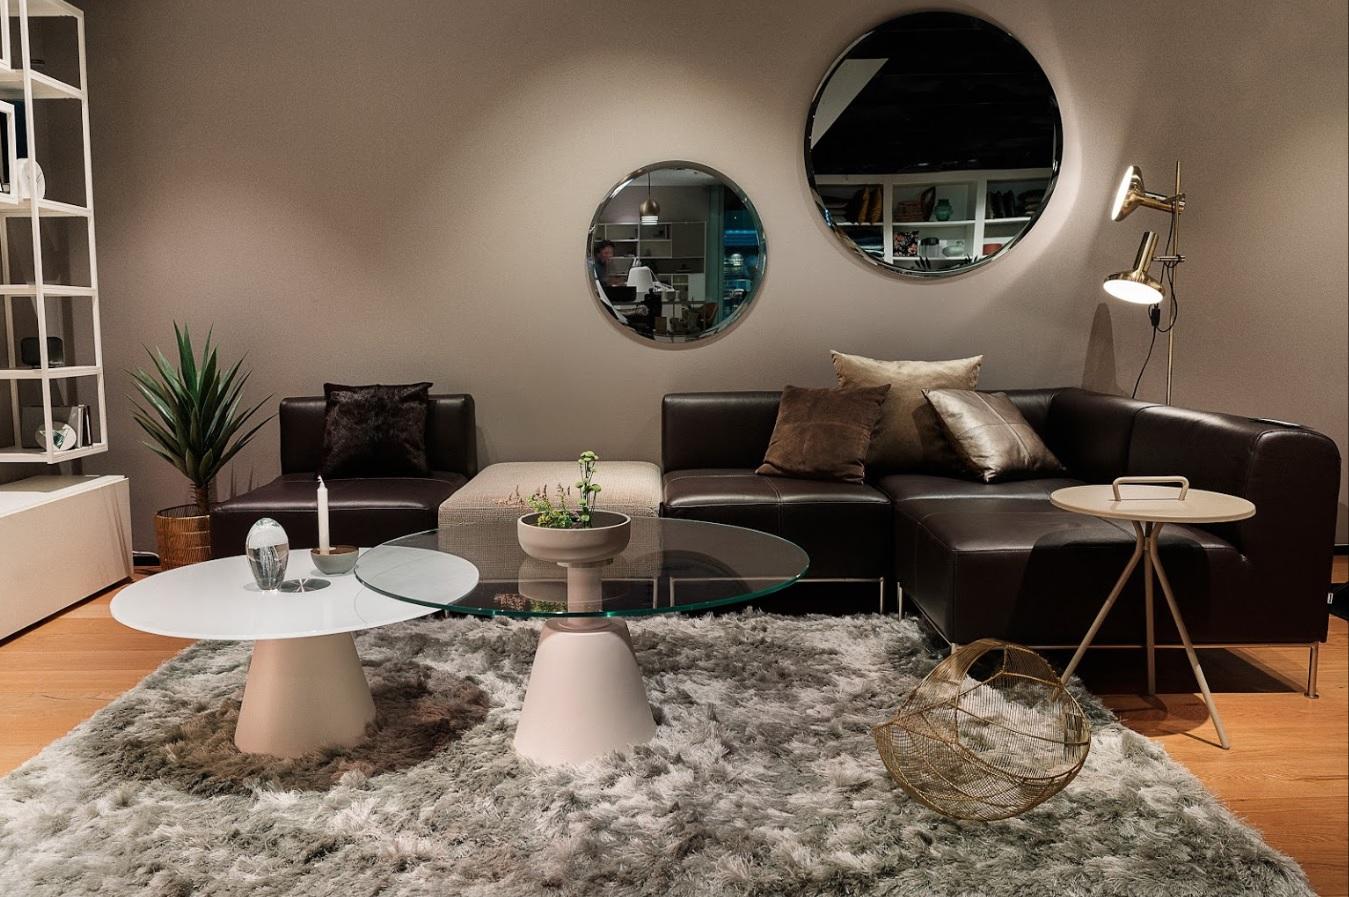 Miami sofa